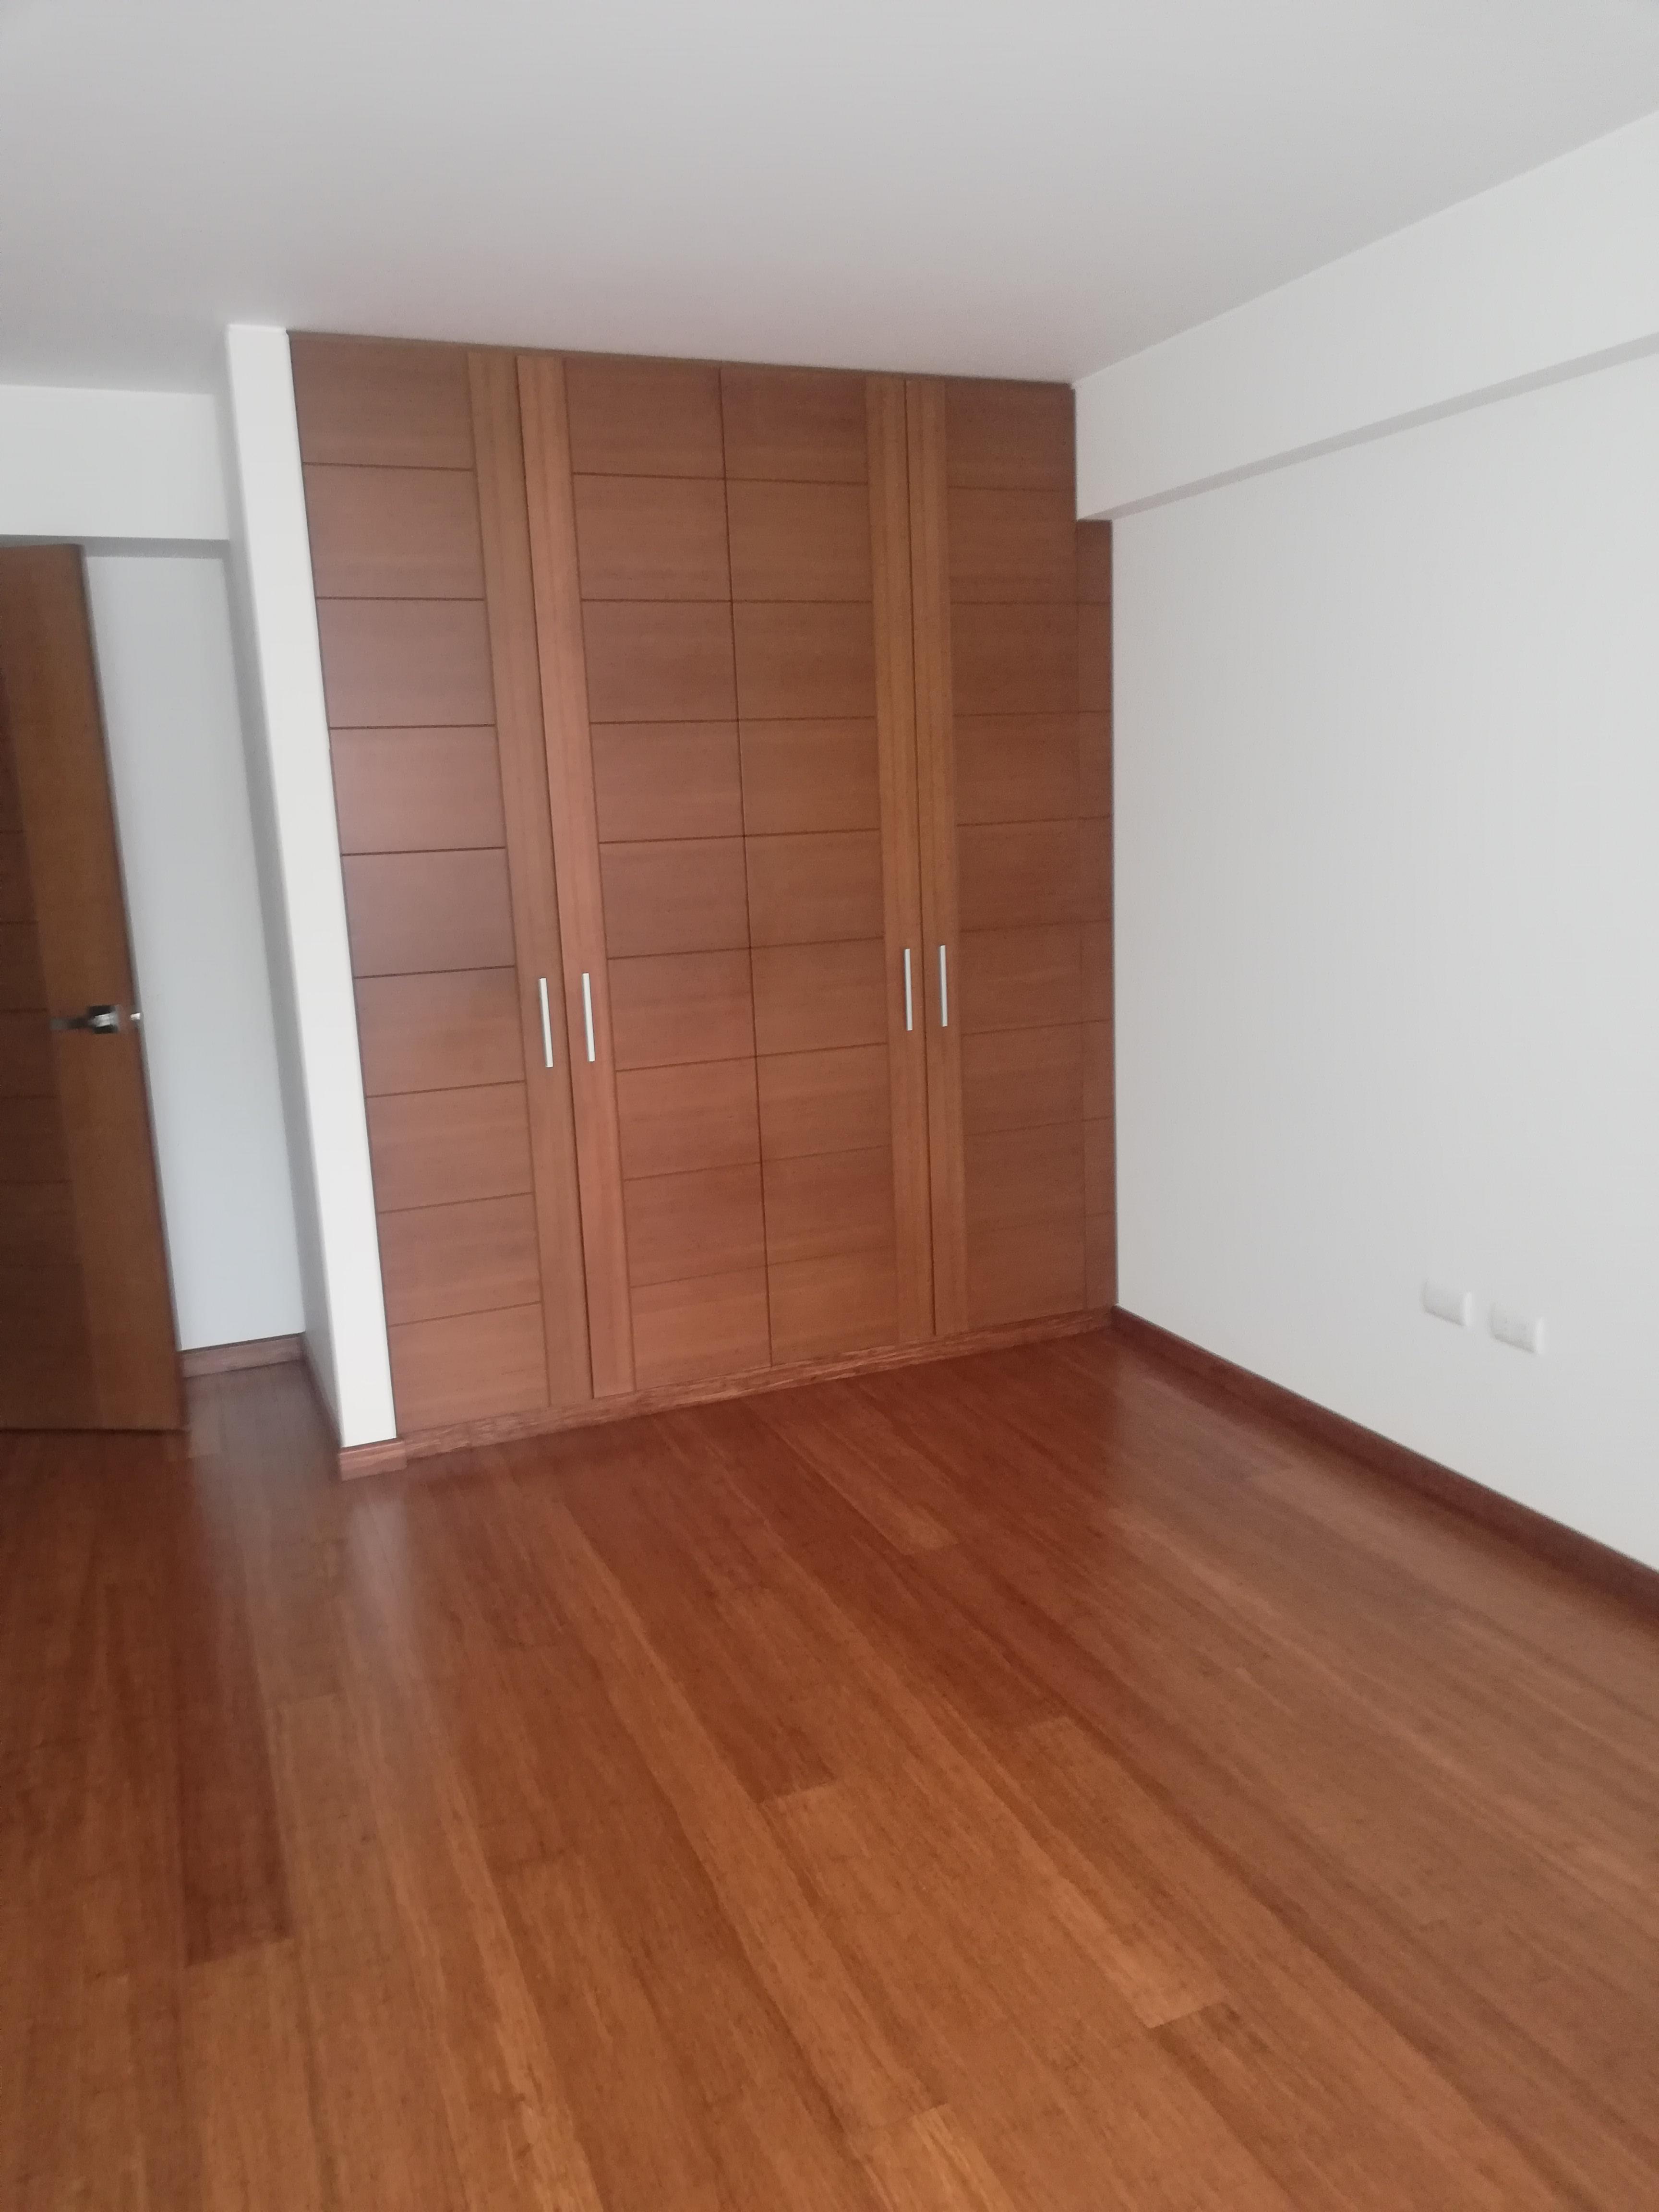 14 Dormitorio Secundario